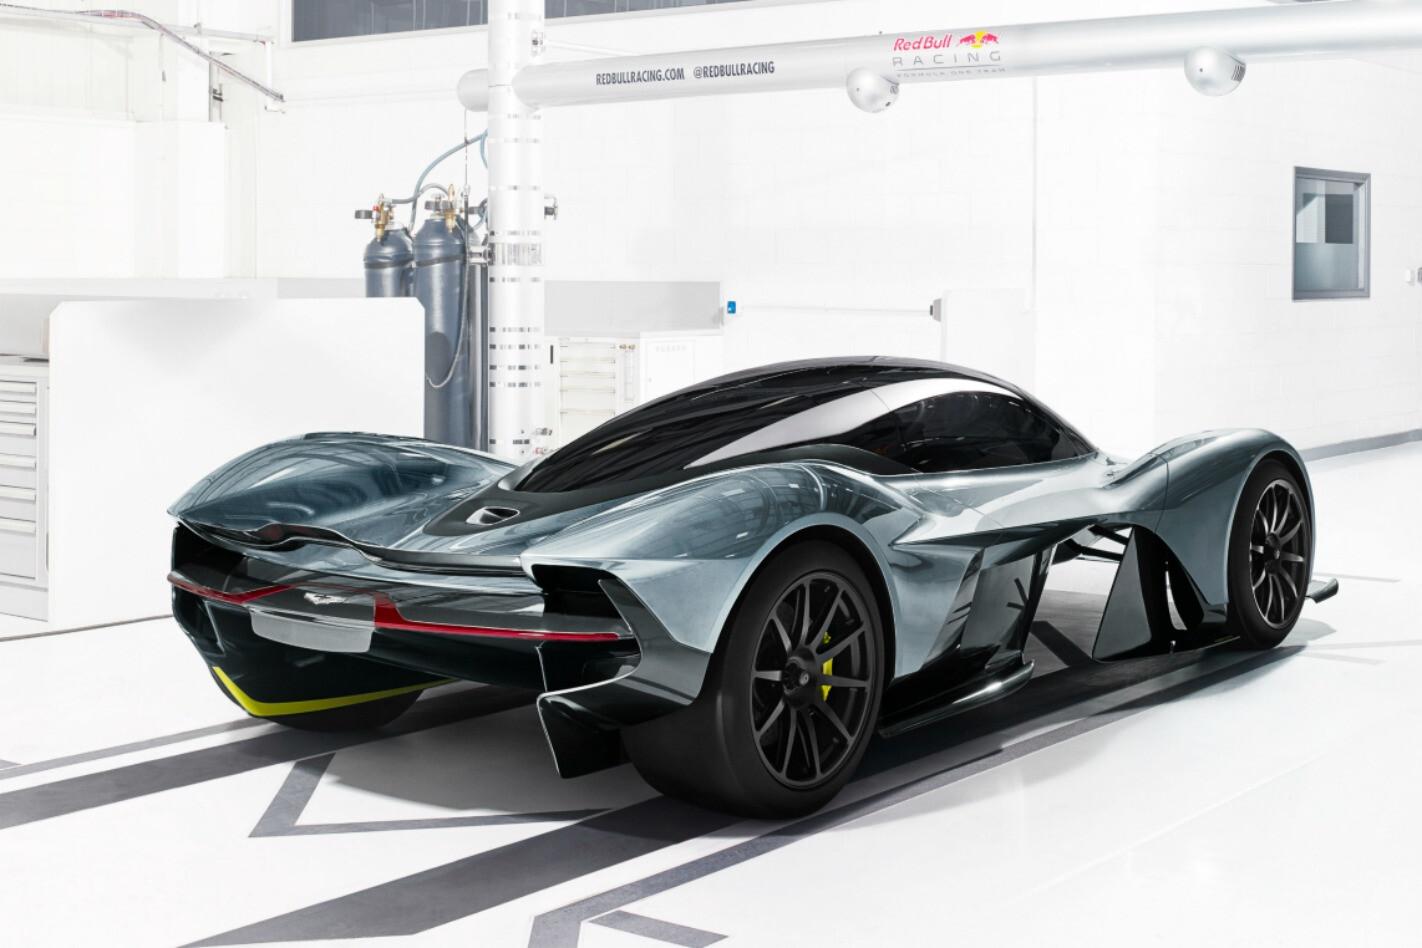 Aston Martin AM-RB 001 Rear Main